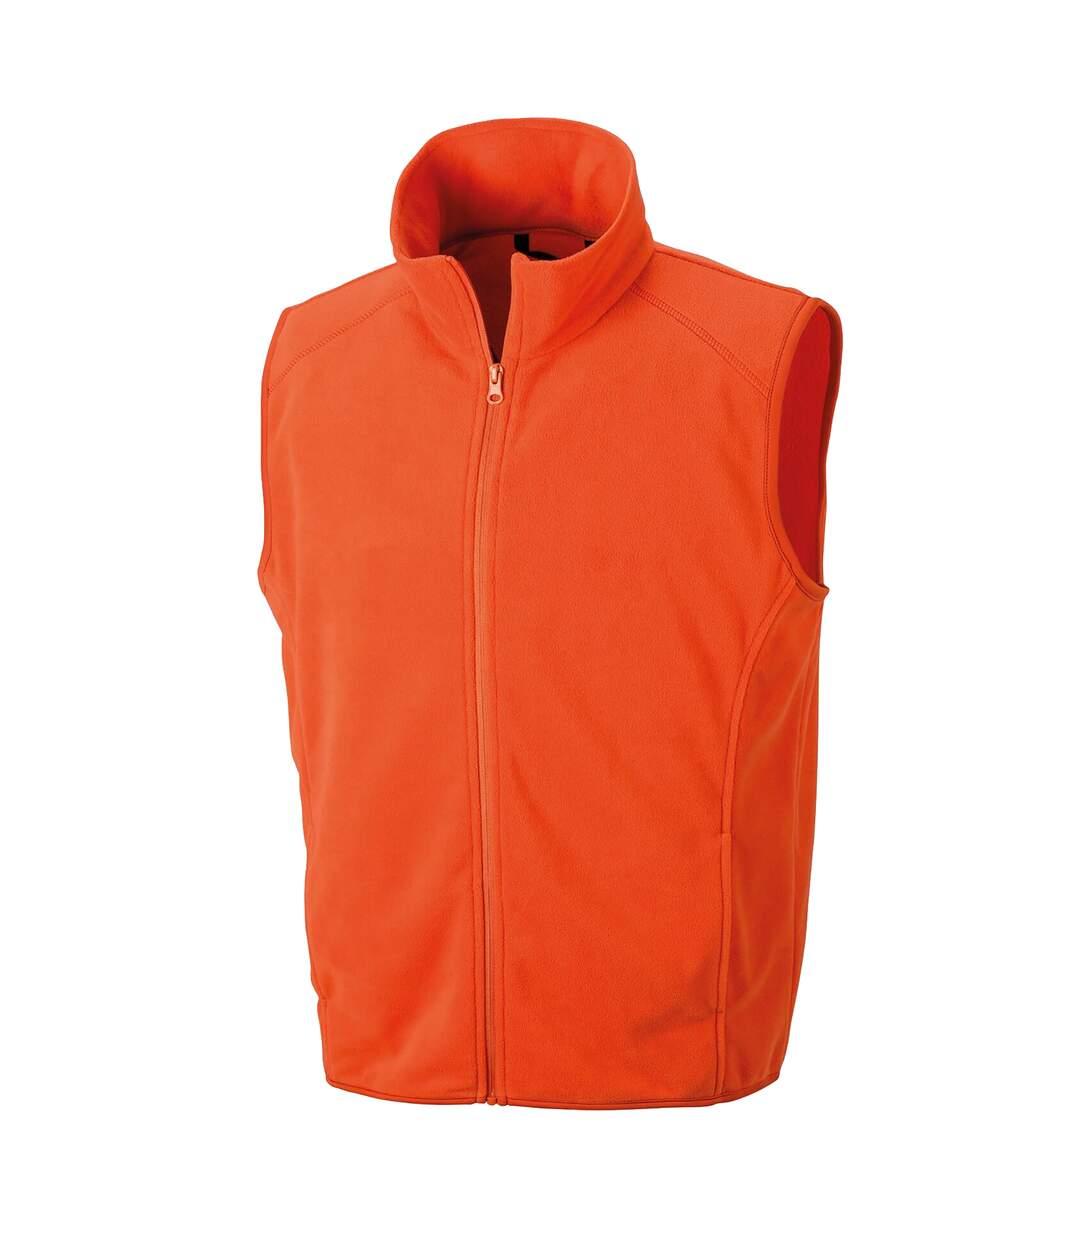 Result - Gilet sans manches CORE - Homme (Orange) - UTPC3013